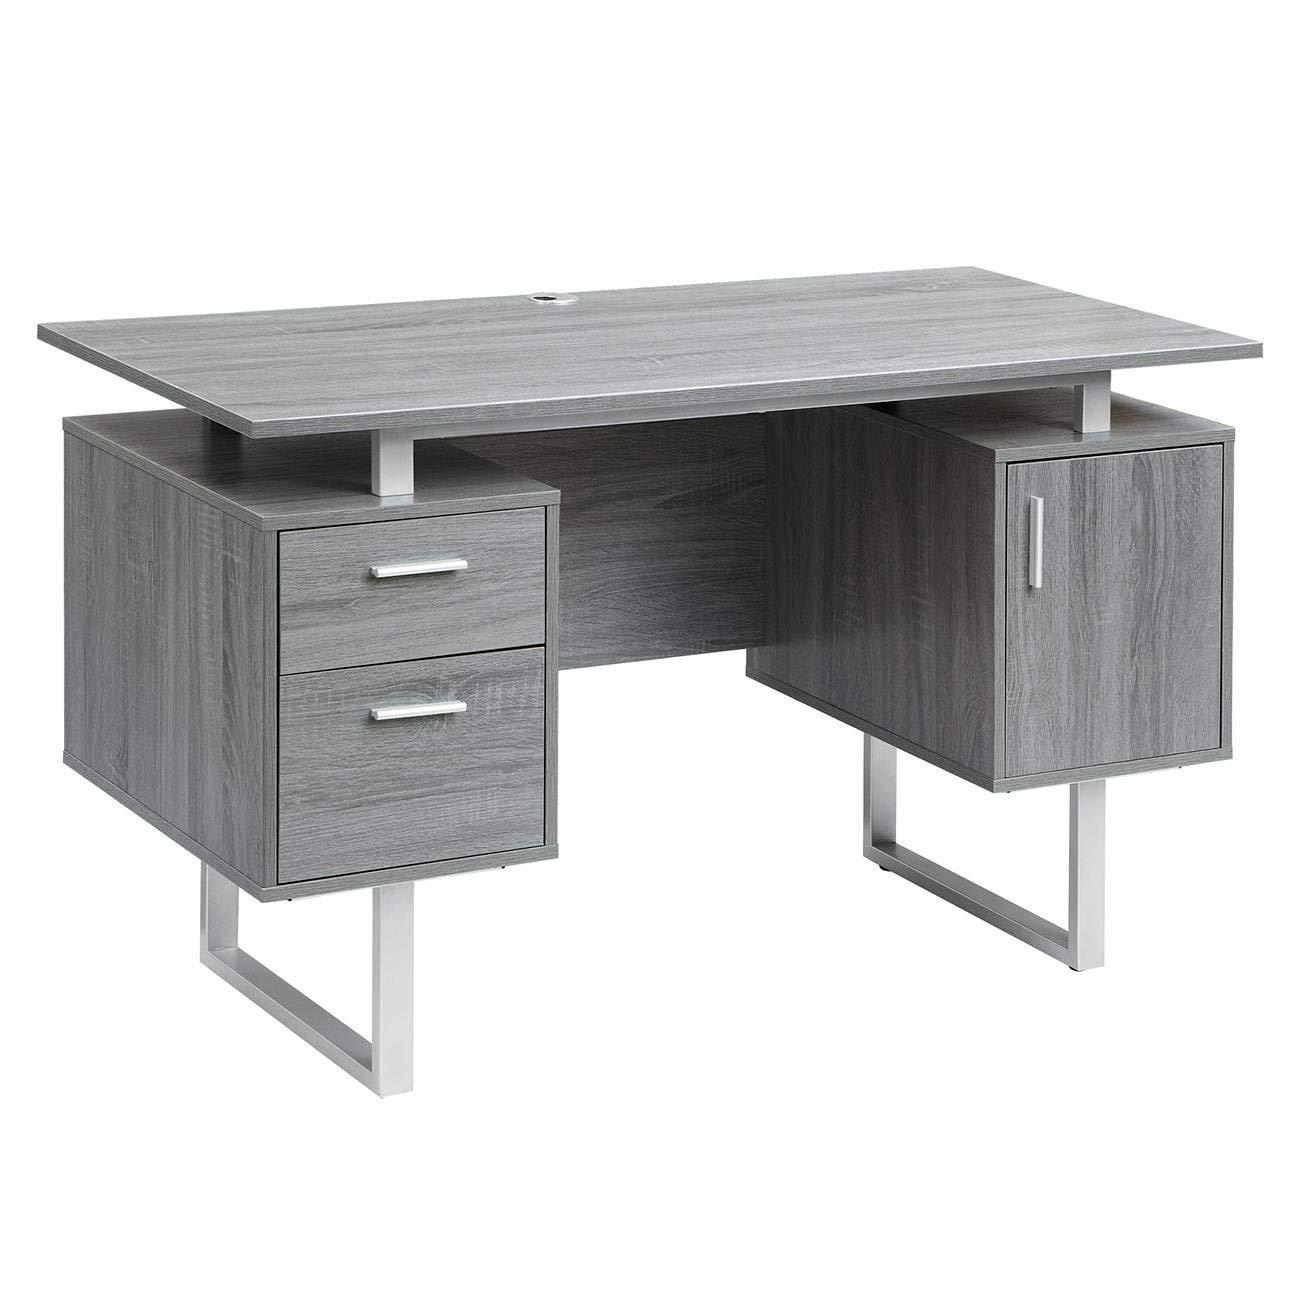 Techni Mobili RTA-7002-GRY Modern Office Desk with Storage, Gray by Techni Mobili